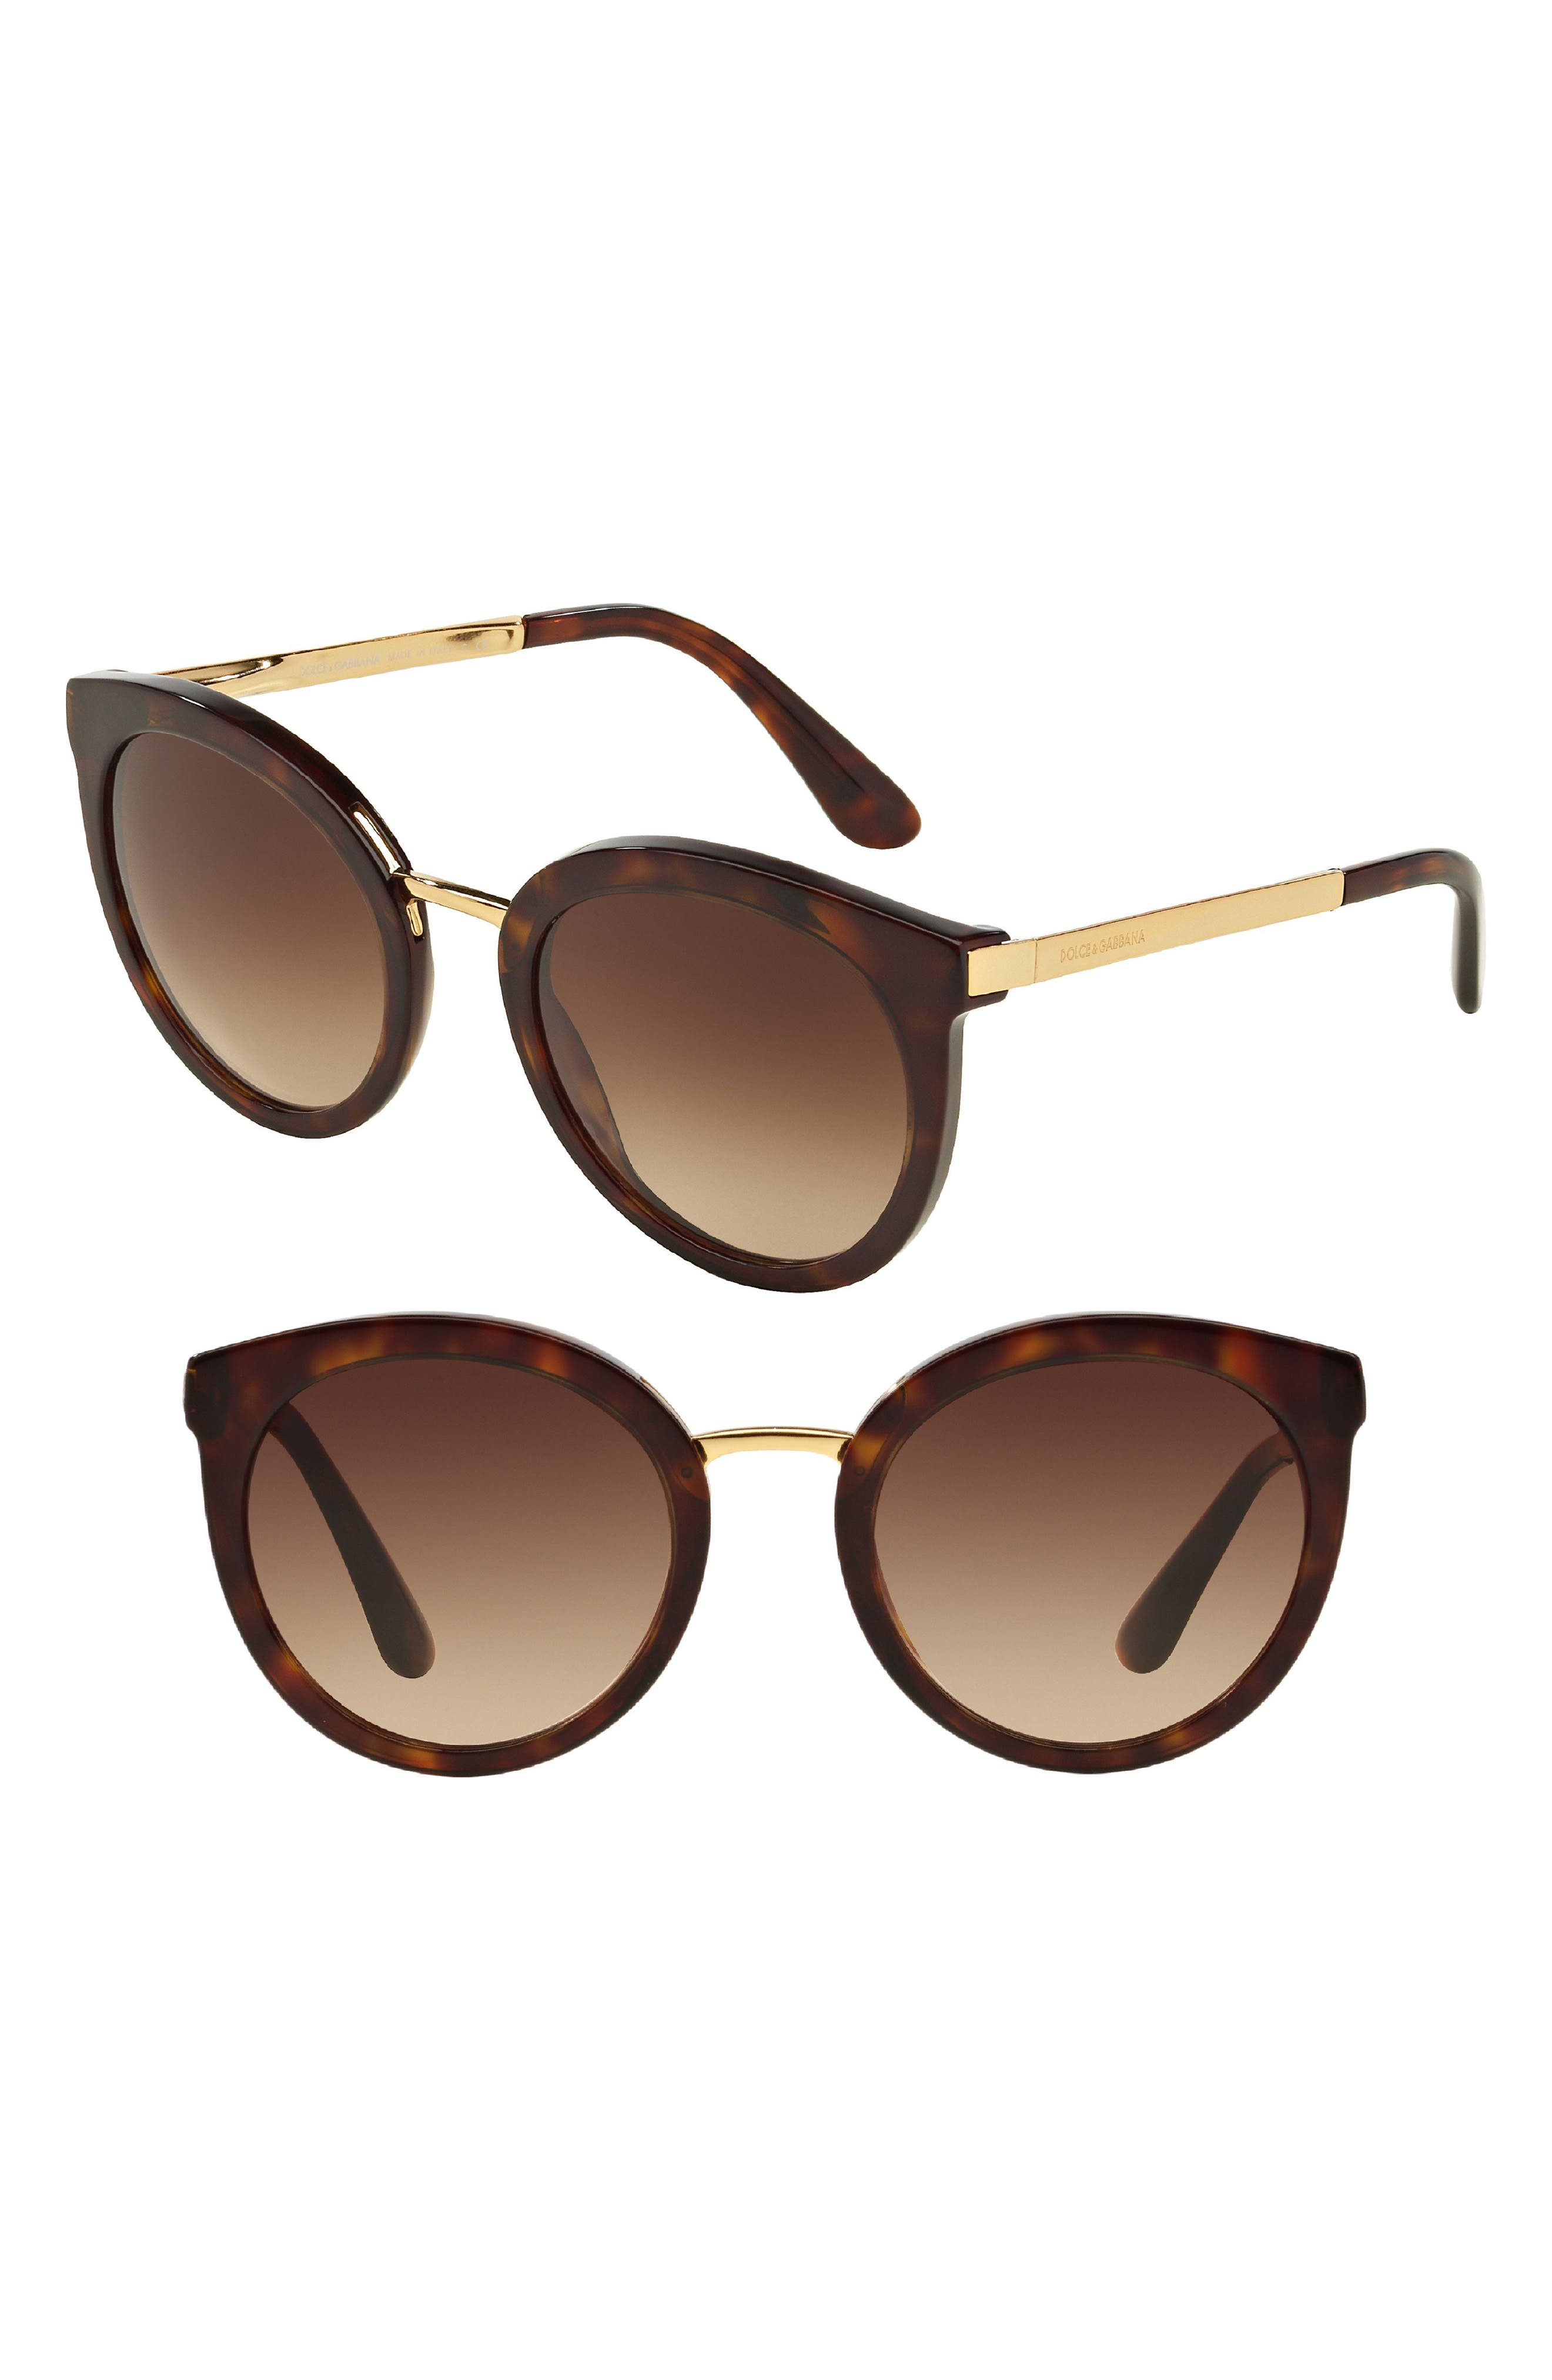 Alternate Image 1 Selected - Dolce&Gabbana 52mm Round Sunglasses